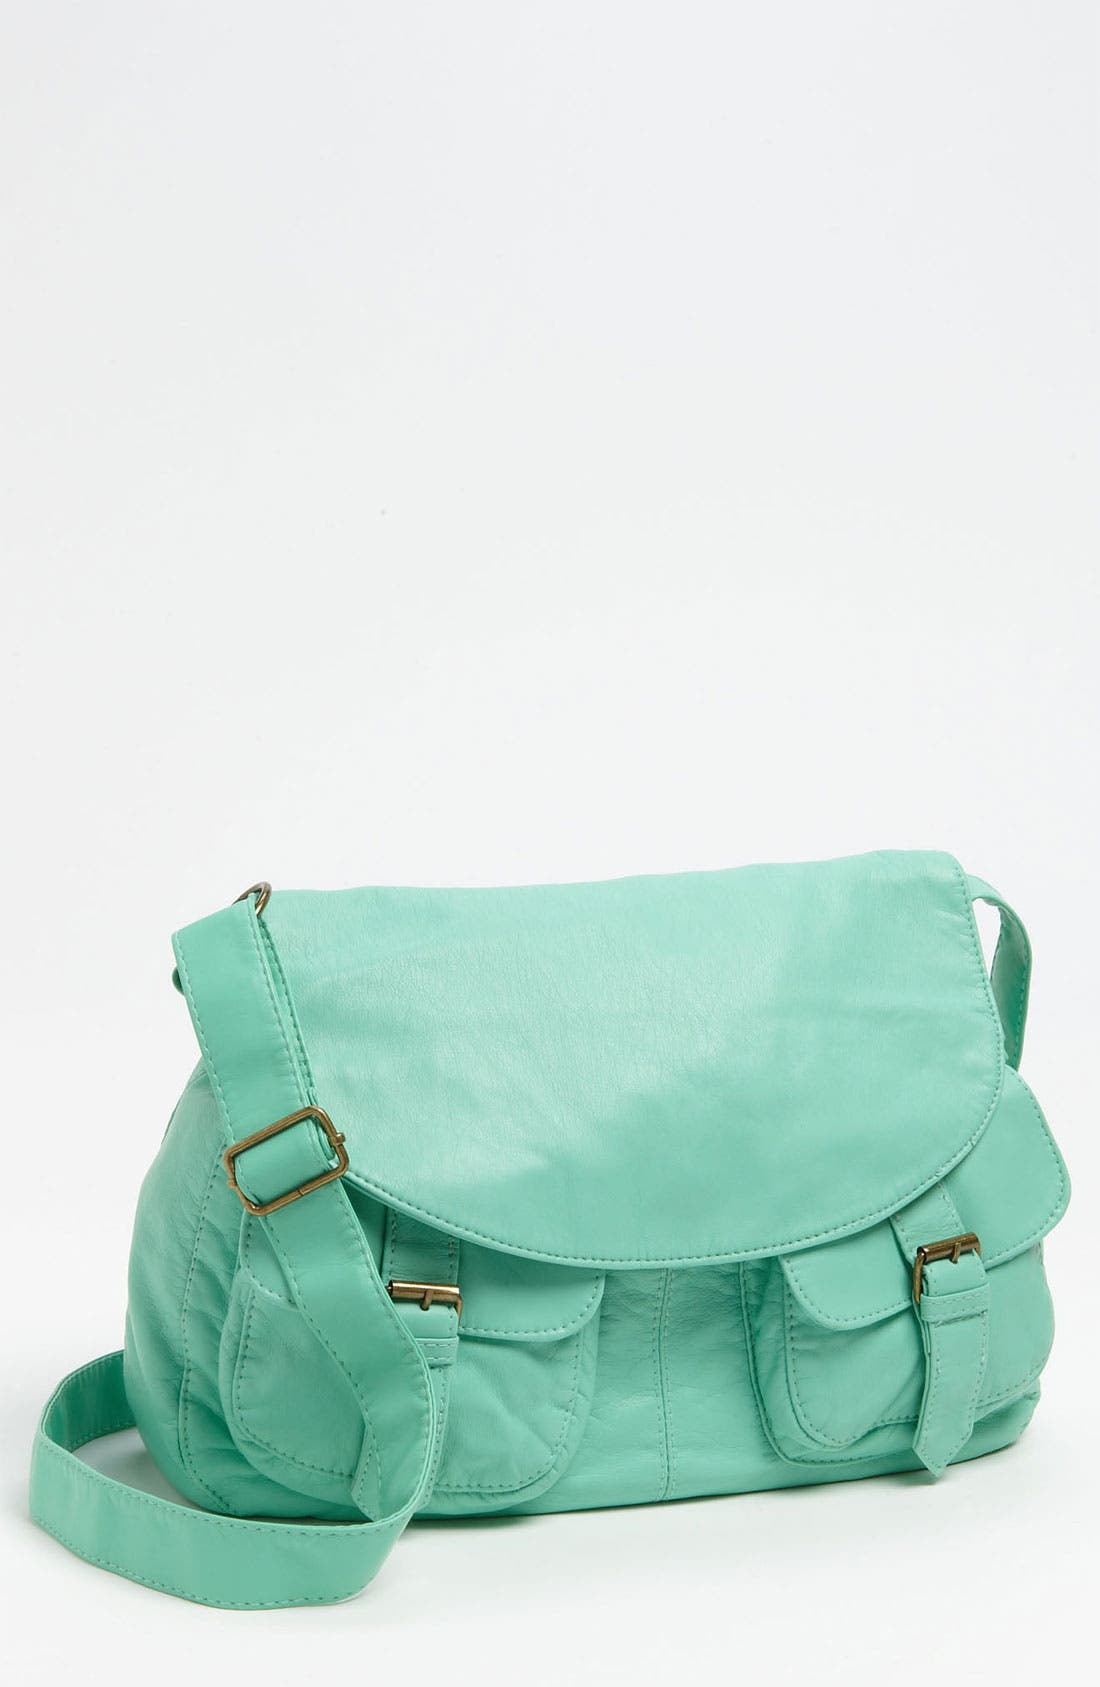 Main Image - T-Shirt & Jeans Crossbody Bag